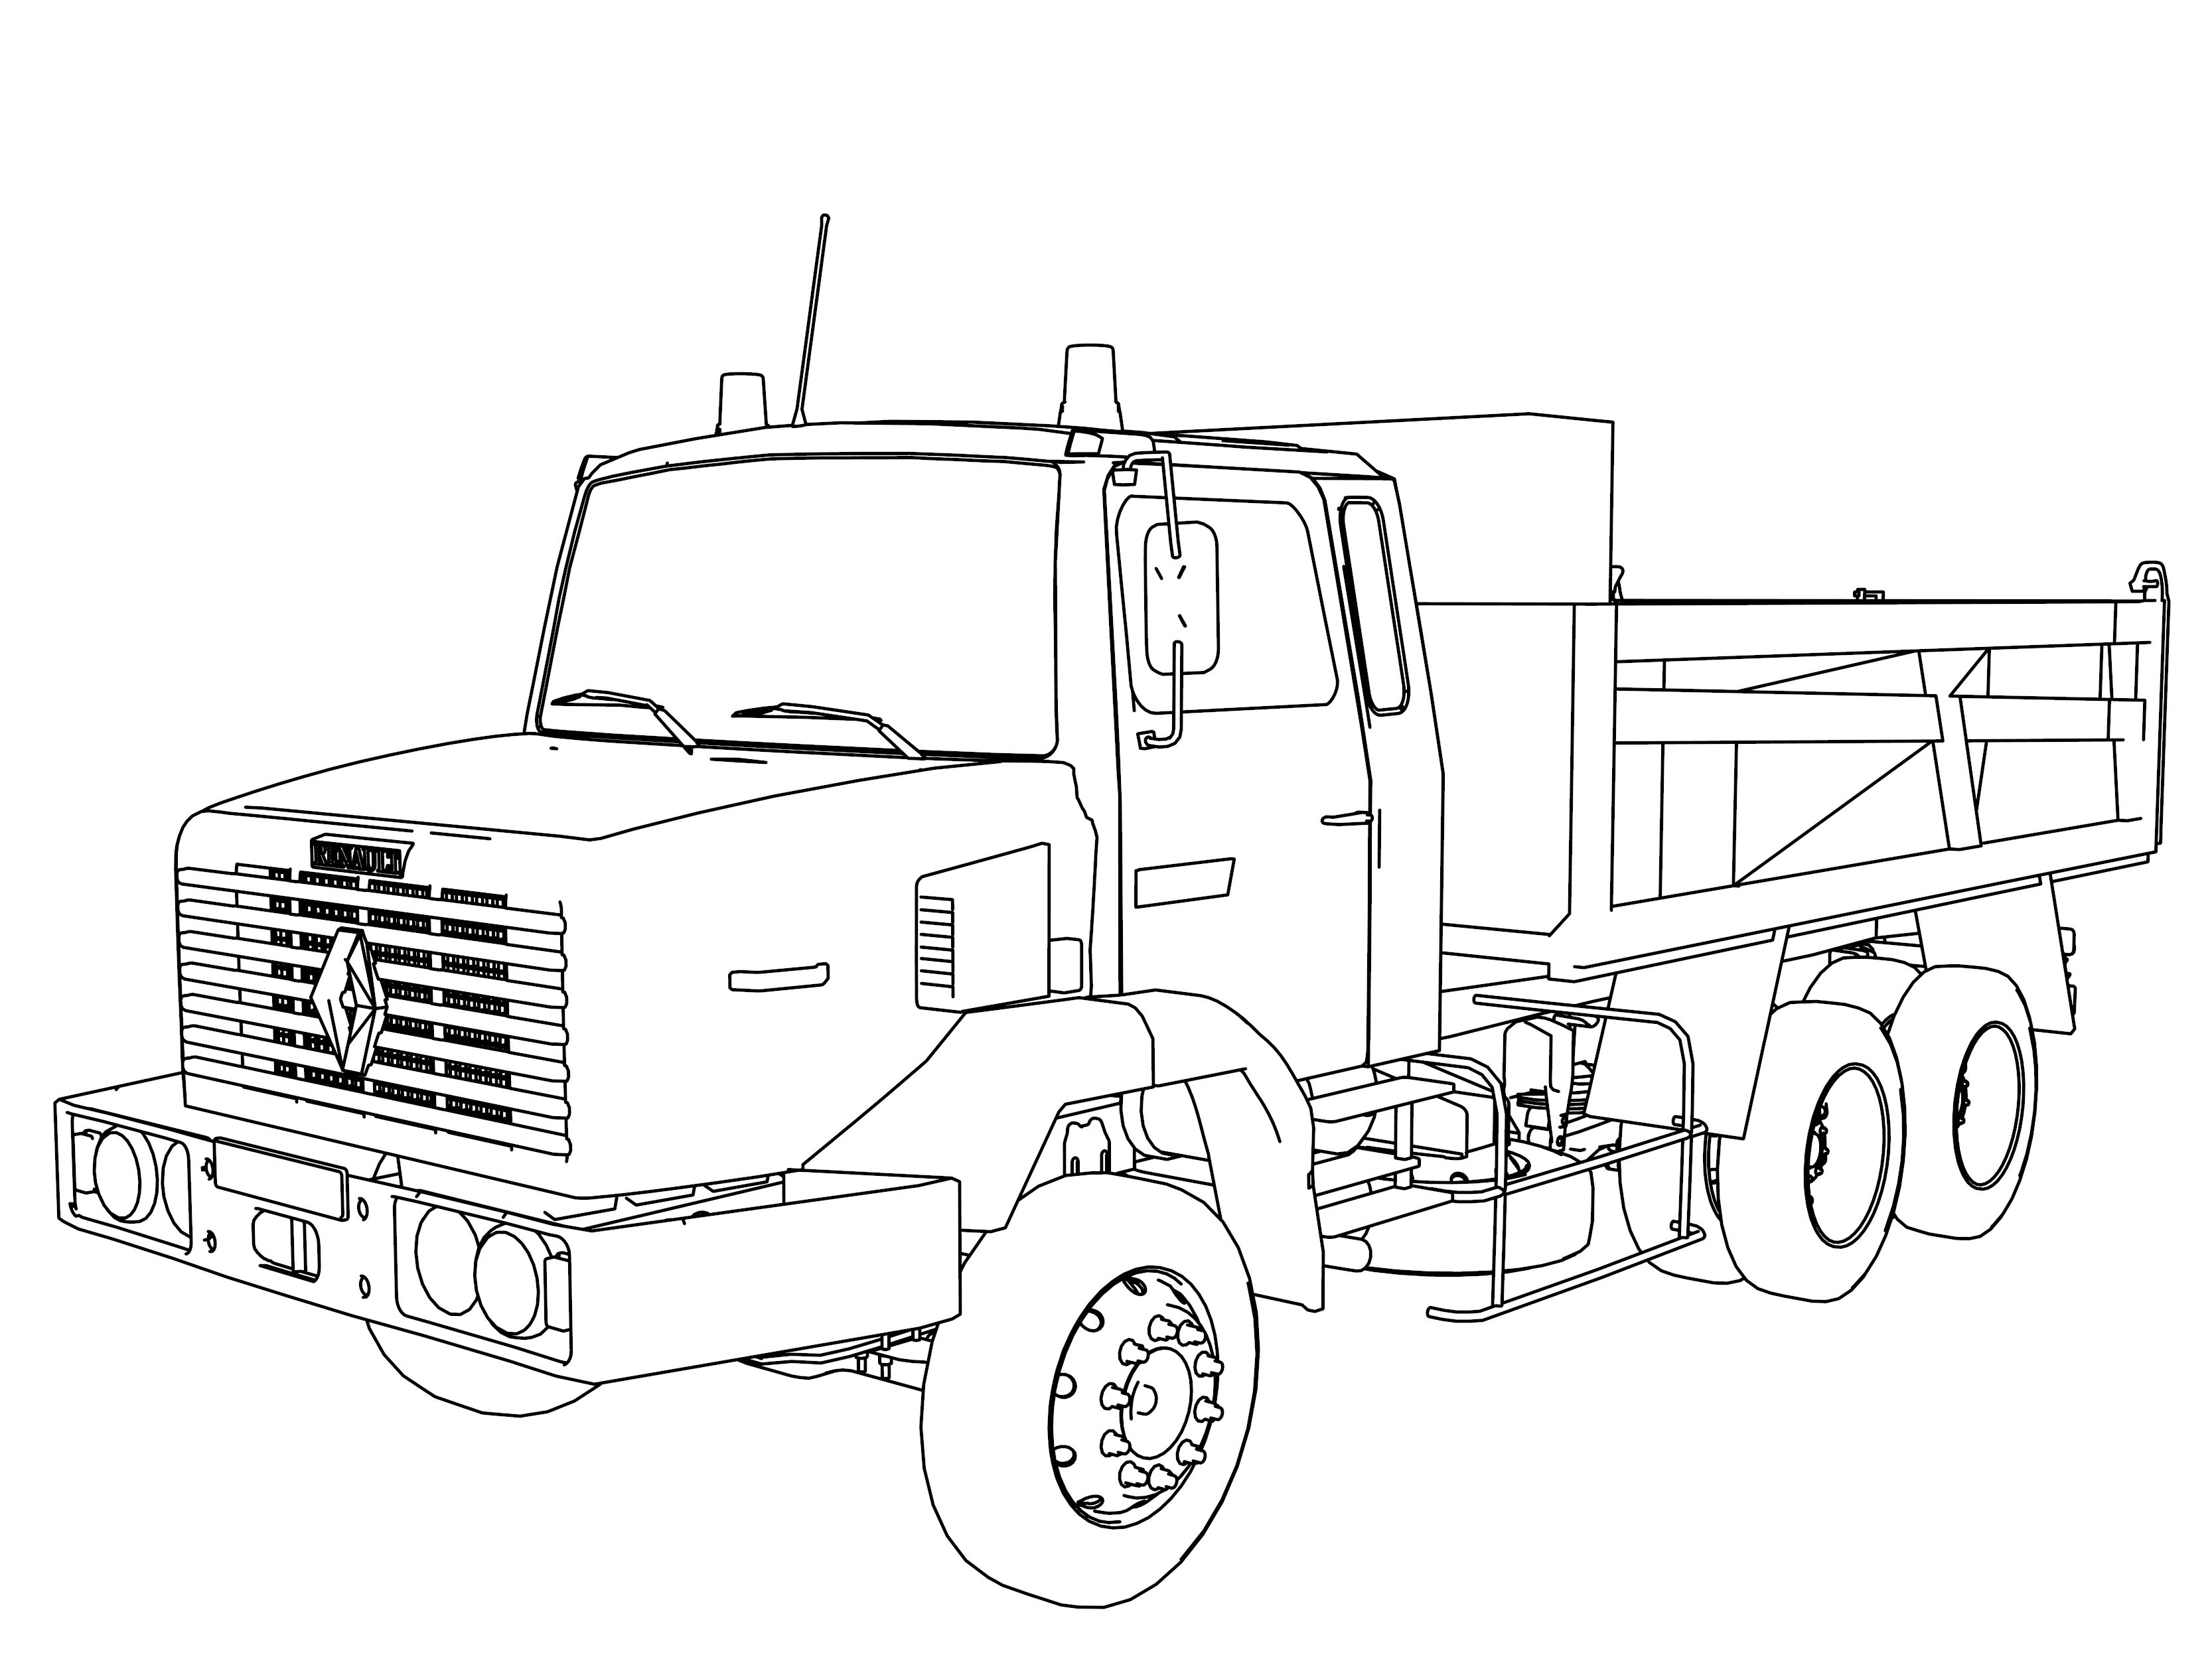 Cool Truck Coloring Pages Truck Coloring Pages Monster Truck Coloring Pages Cars Coloring Pages